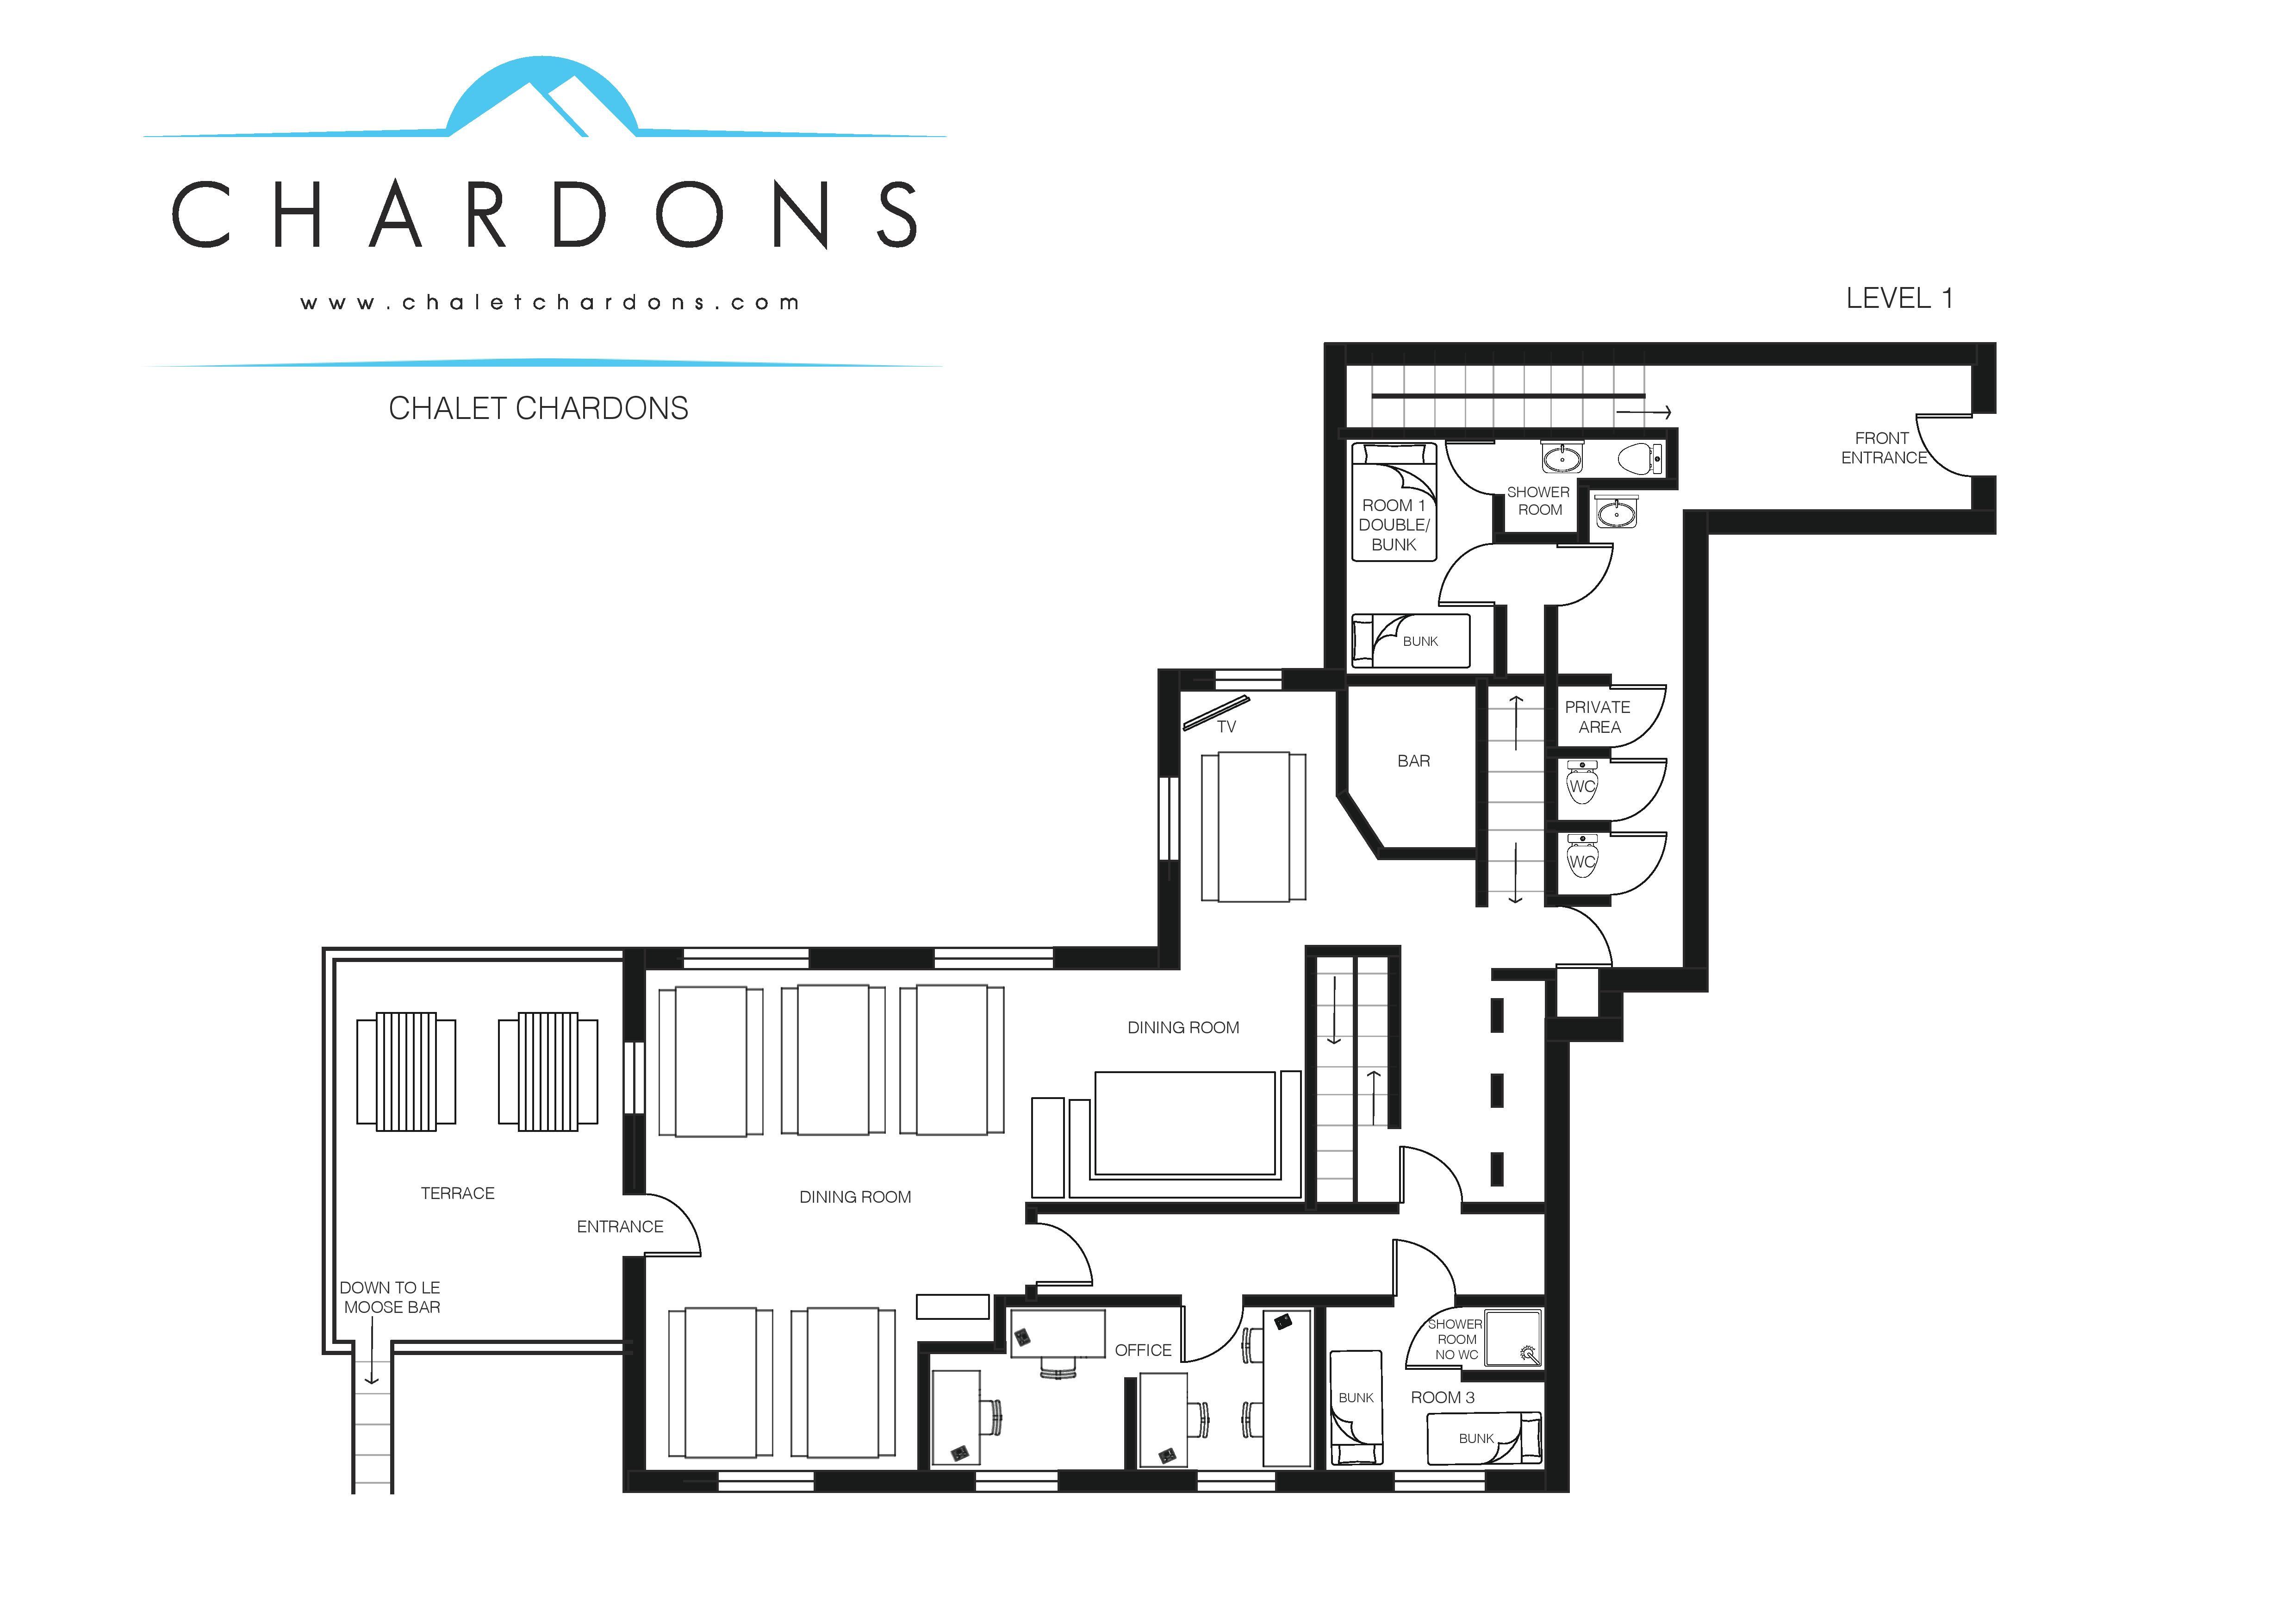 Chalet Chardons Floor Plan Level 1